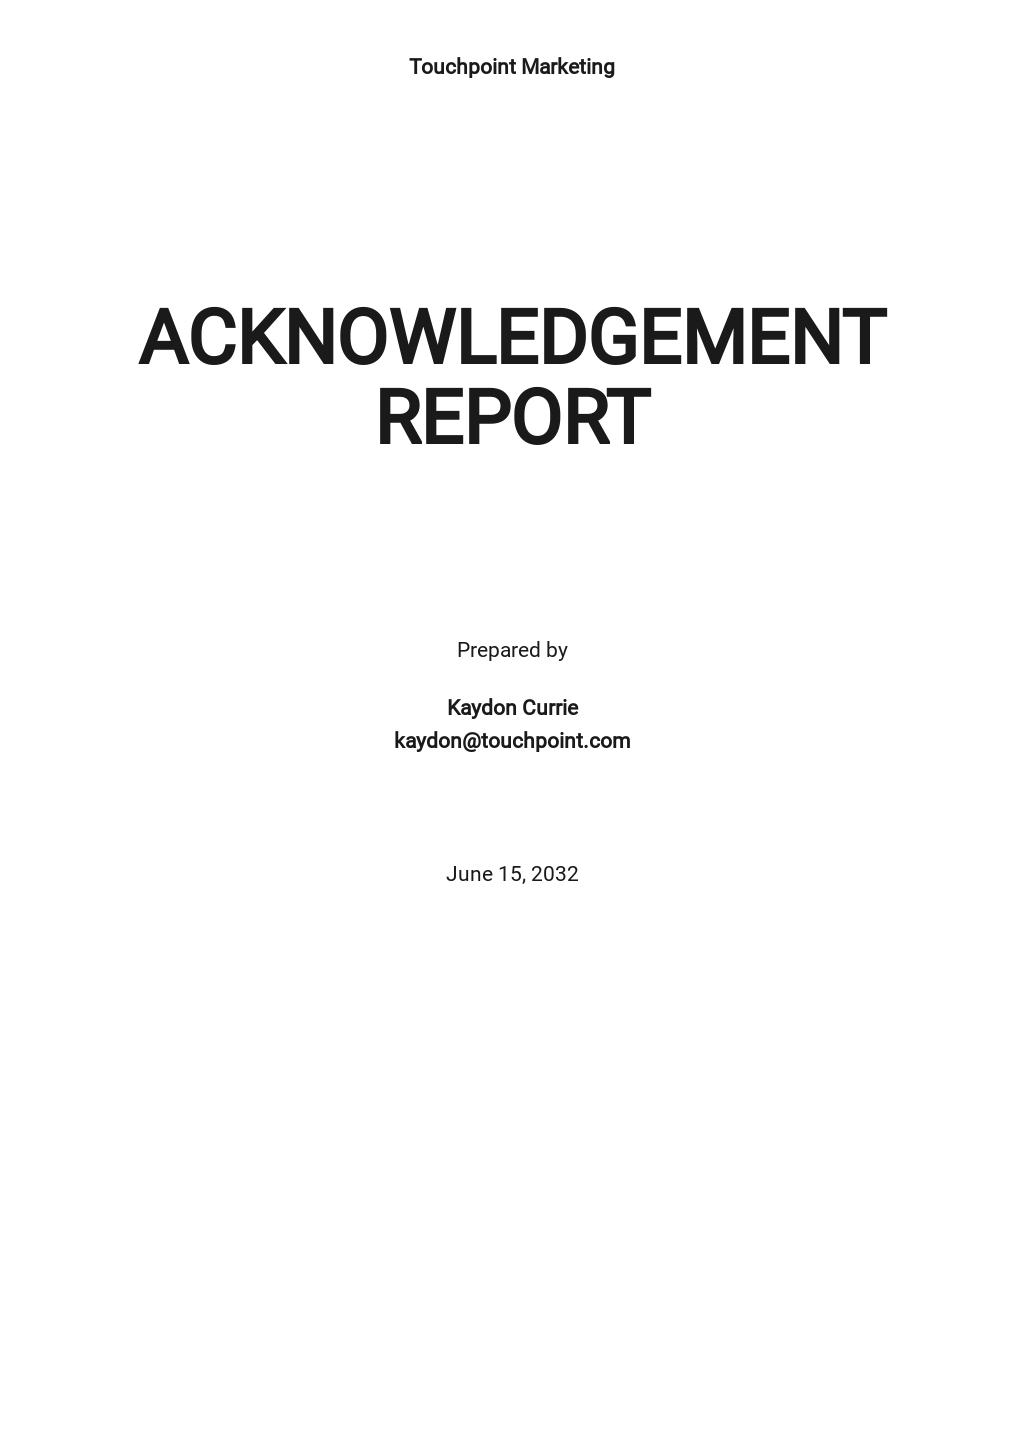 Acknowledgment Report Sample Template